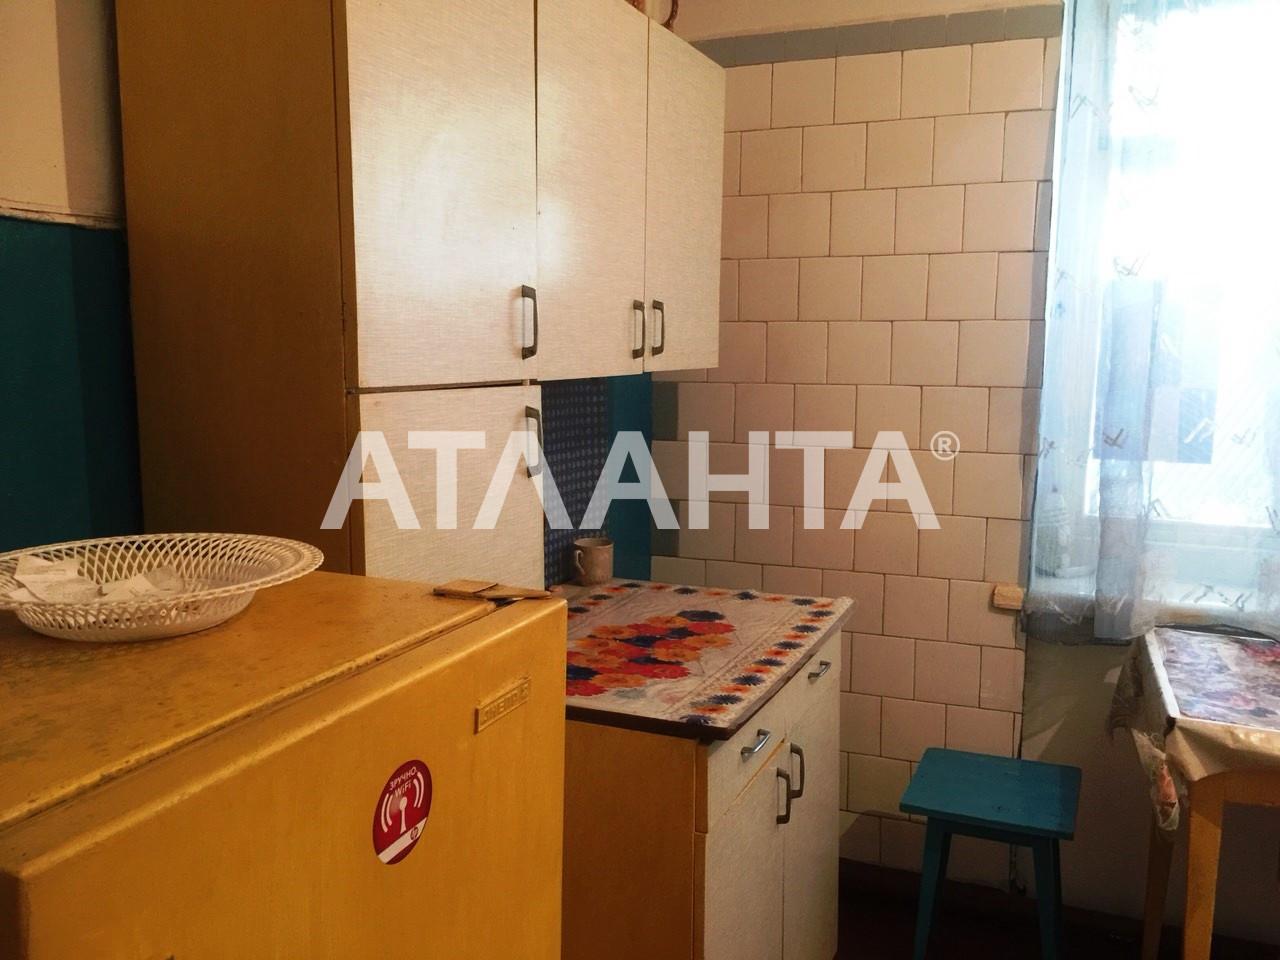 Продается 3-комнатная Квартира на ул. Пр-Т. 40 Лет Освобождения — 23 000 у.е. (фото №3)